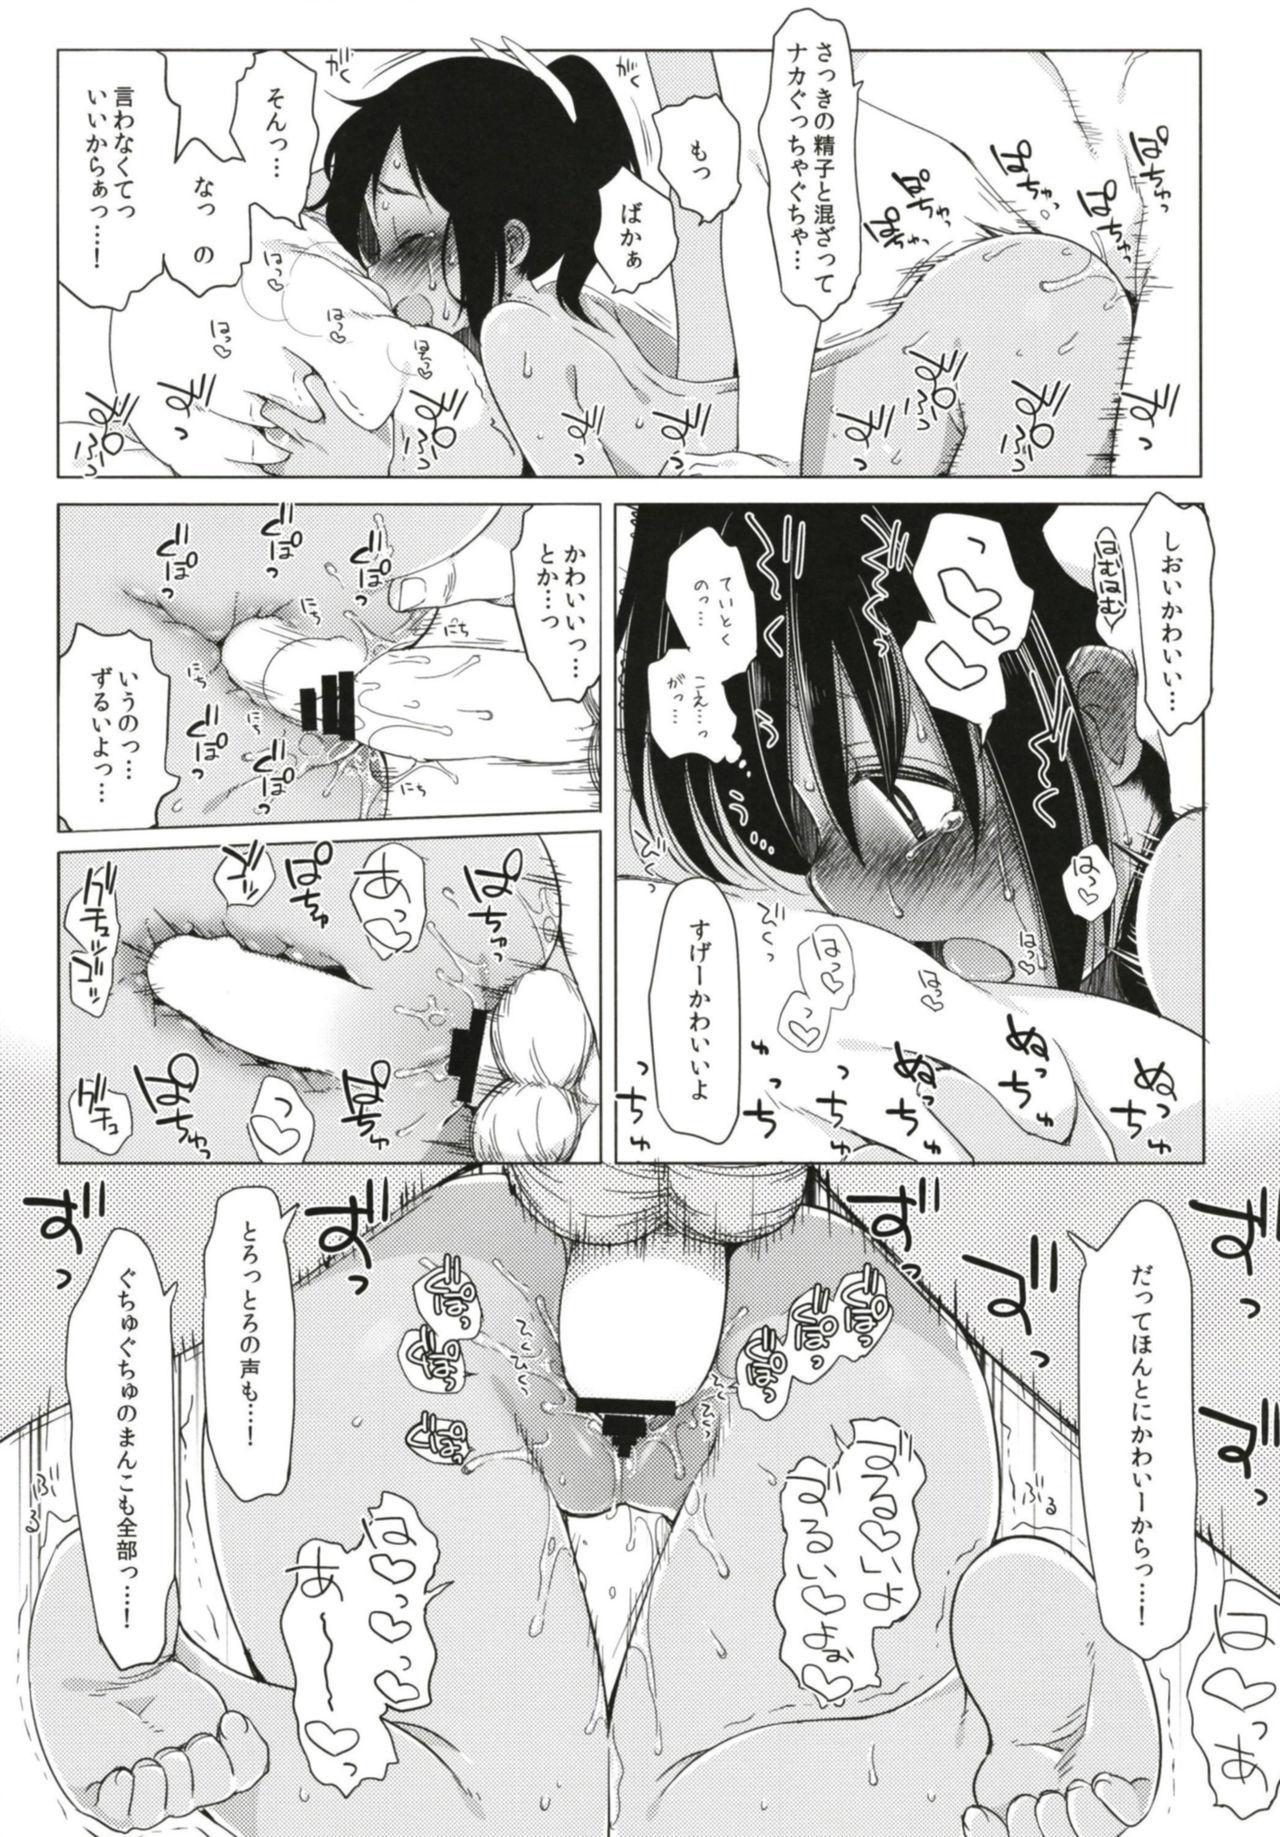 [French letter (Fujisaki Hikari)] Hitonatsu no Ayamachi -I-401 Soushuuhen- (Kantai Collection -KanColle-) [Digital] 24